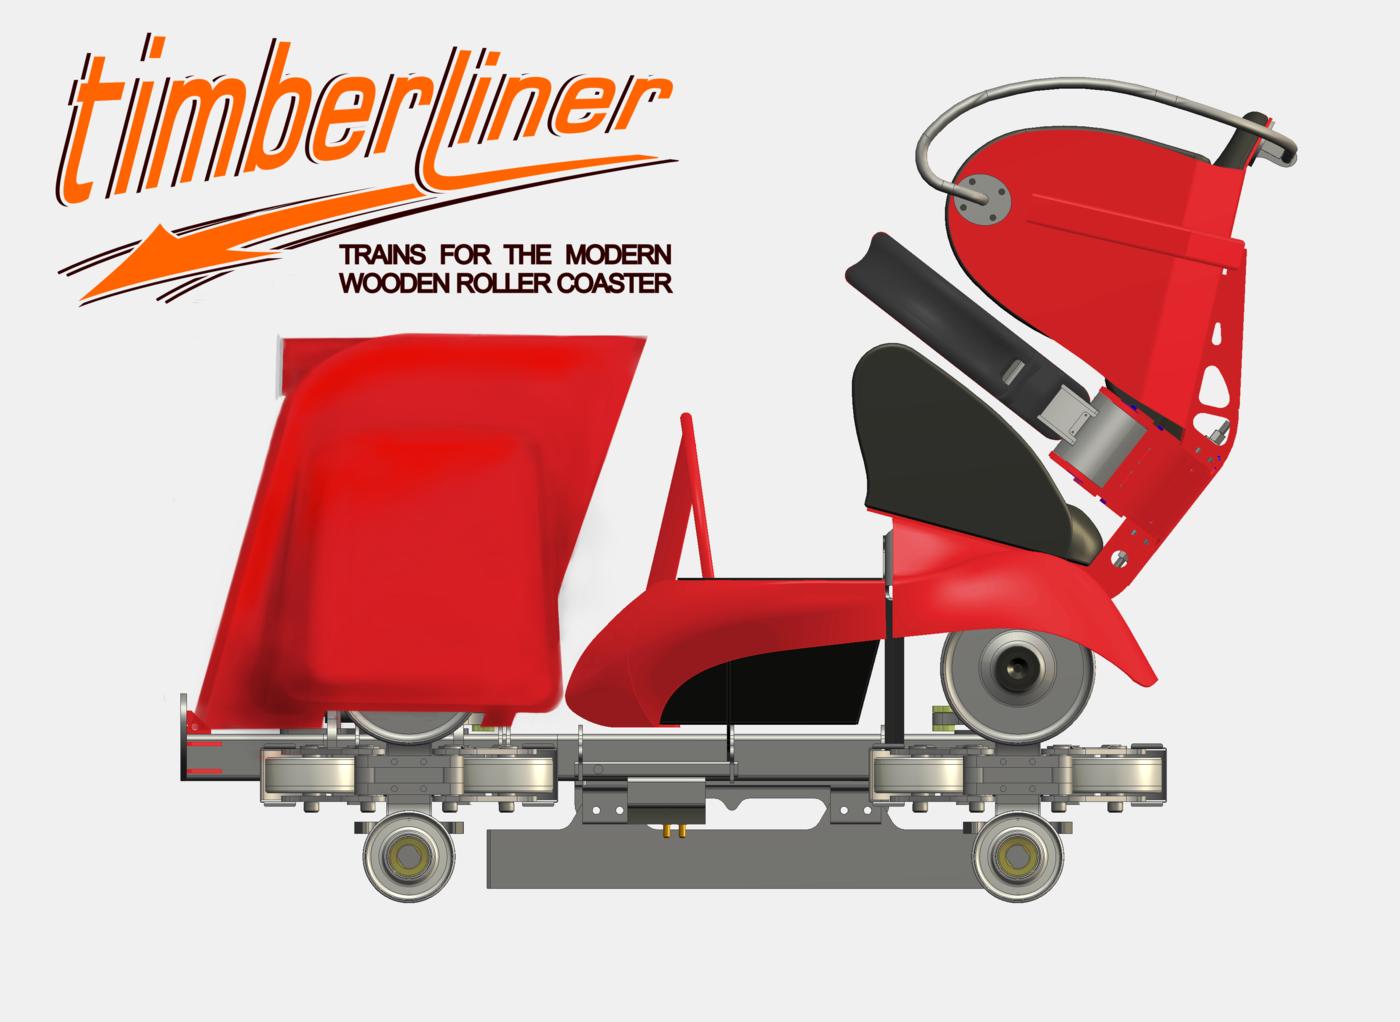 Timberliner Concept by A  Pennington at Coroflot com